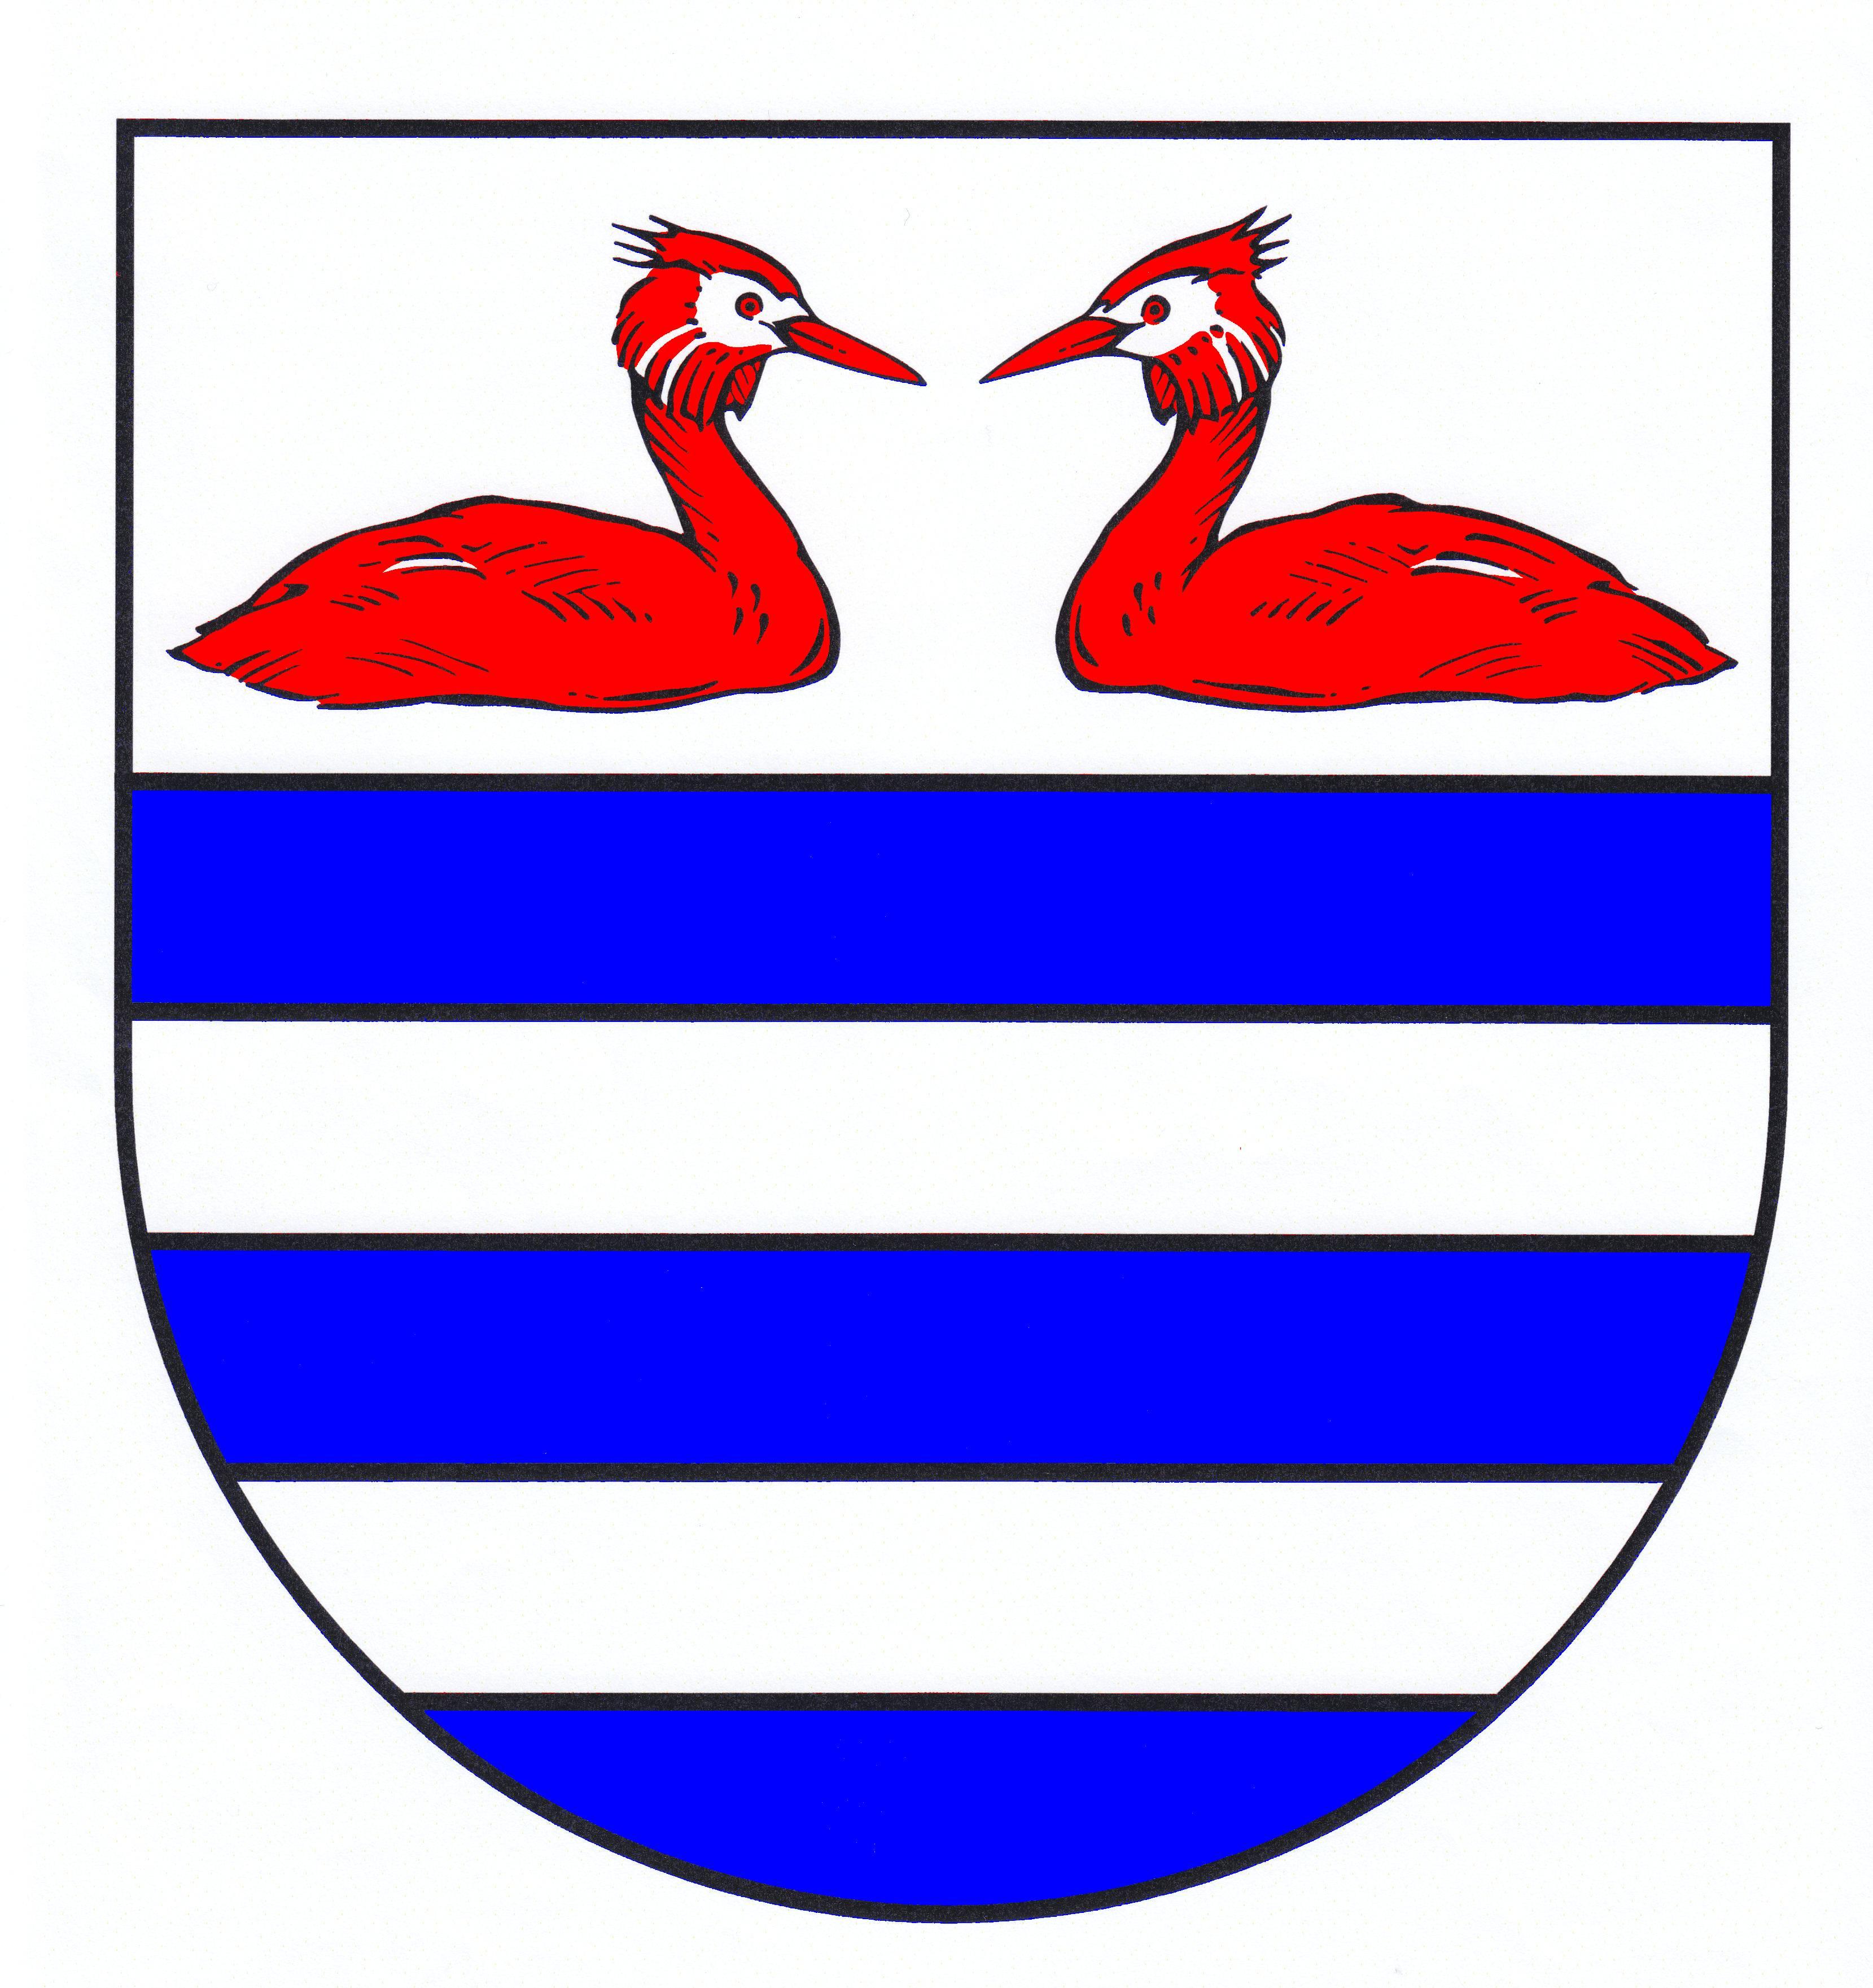 Wappen GemeindePassade, Kreis Plön